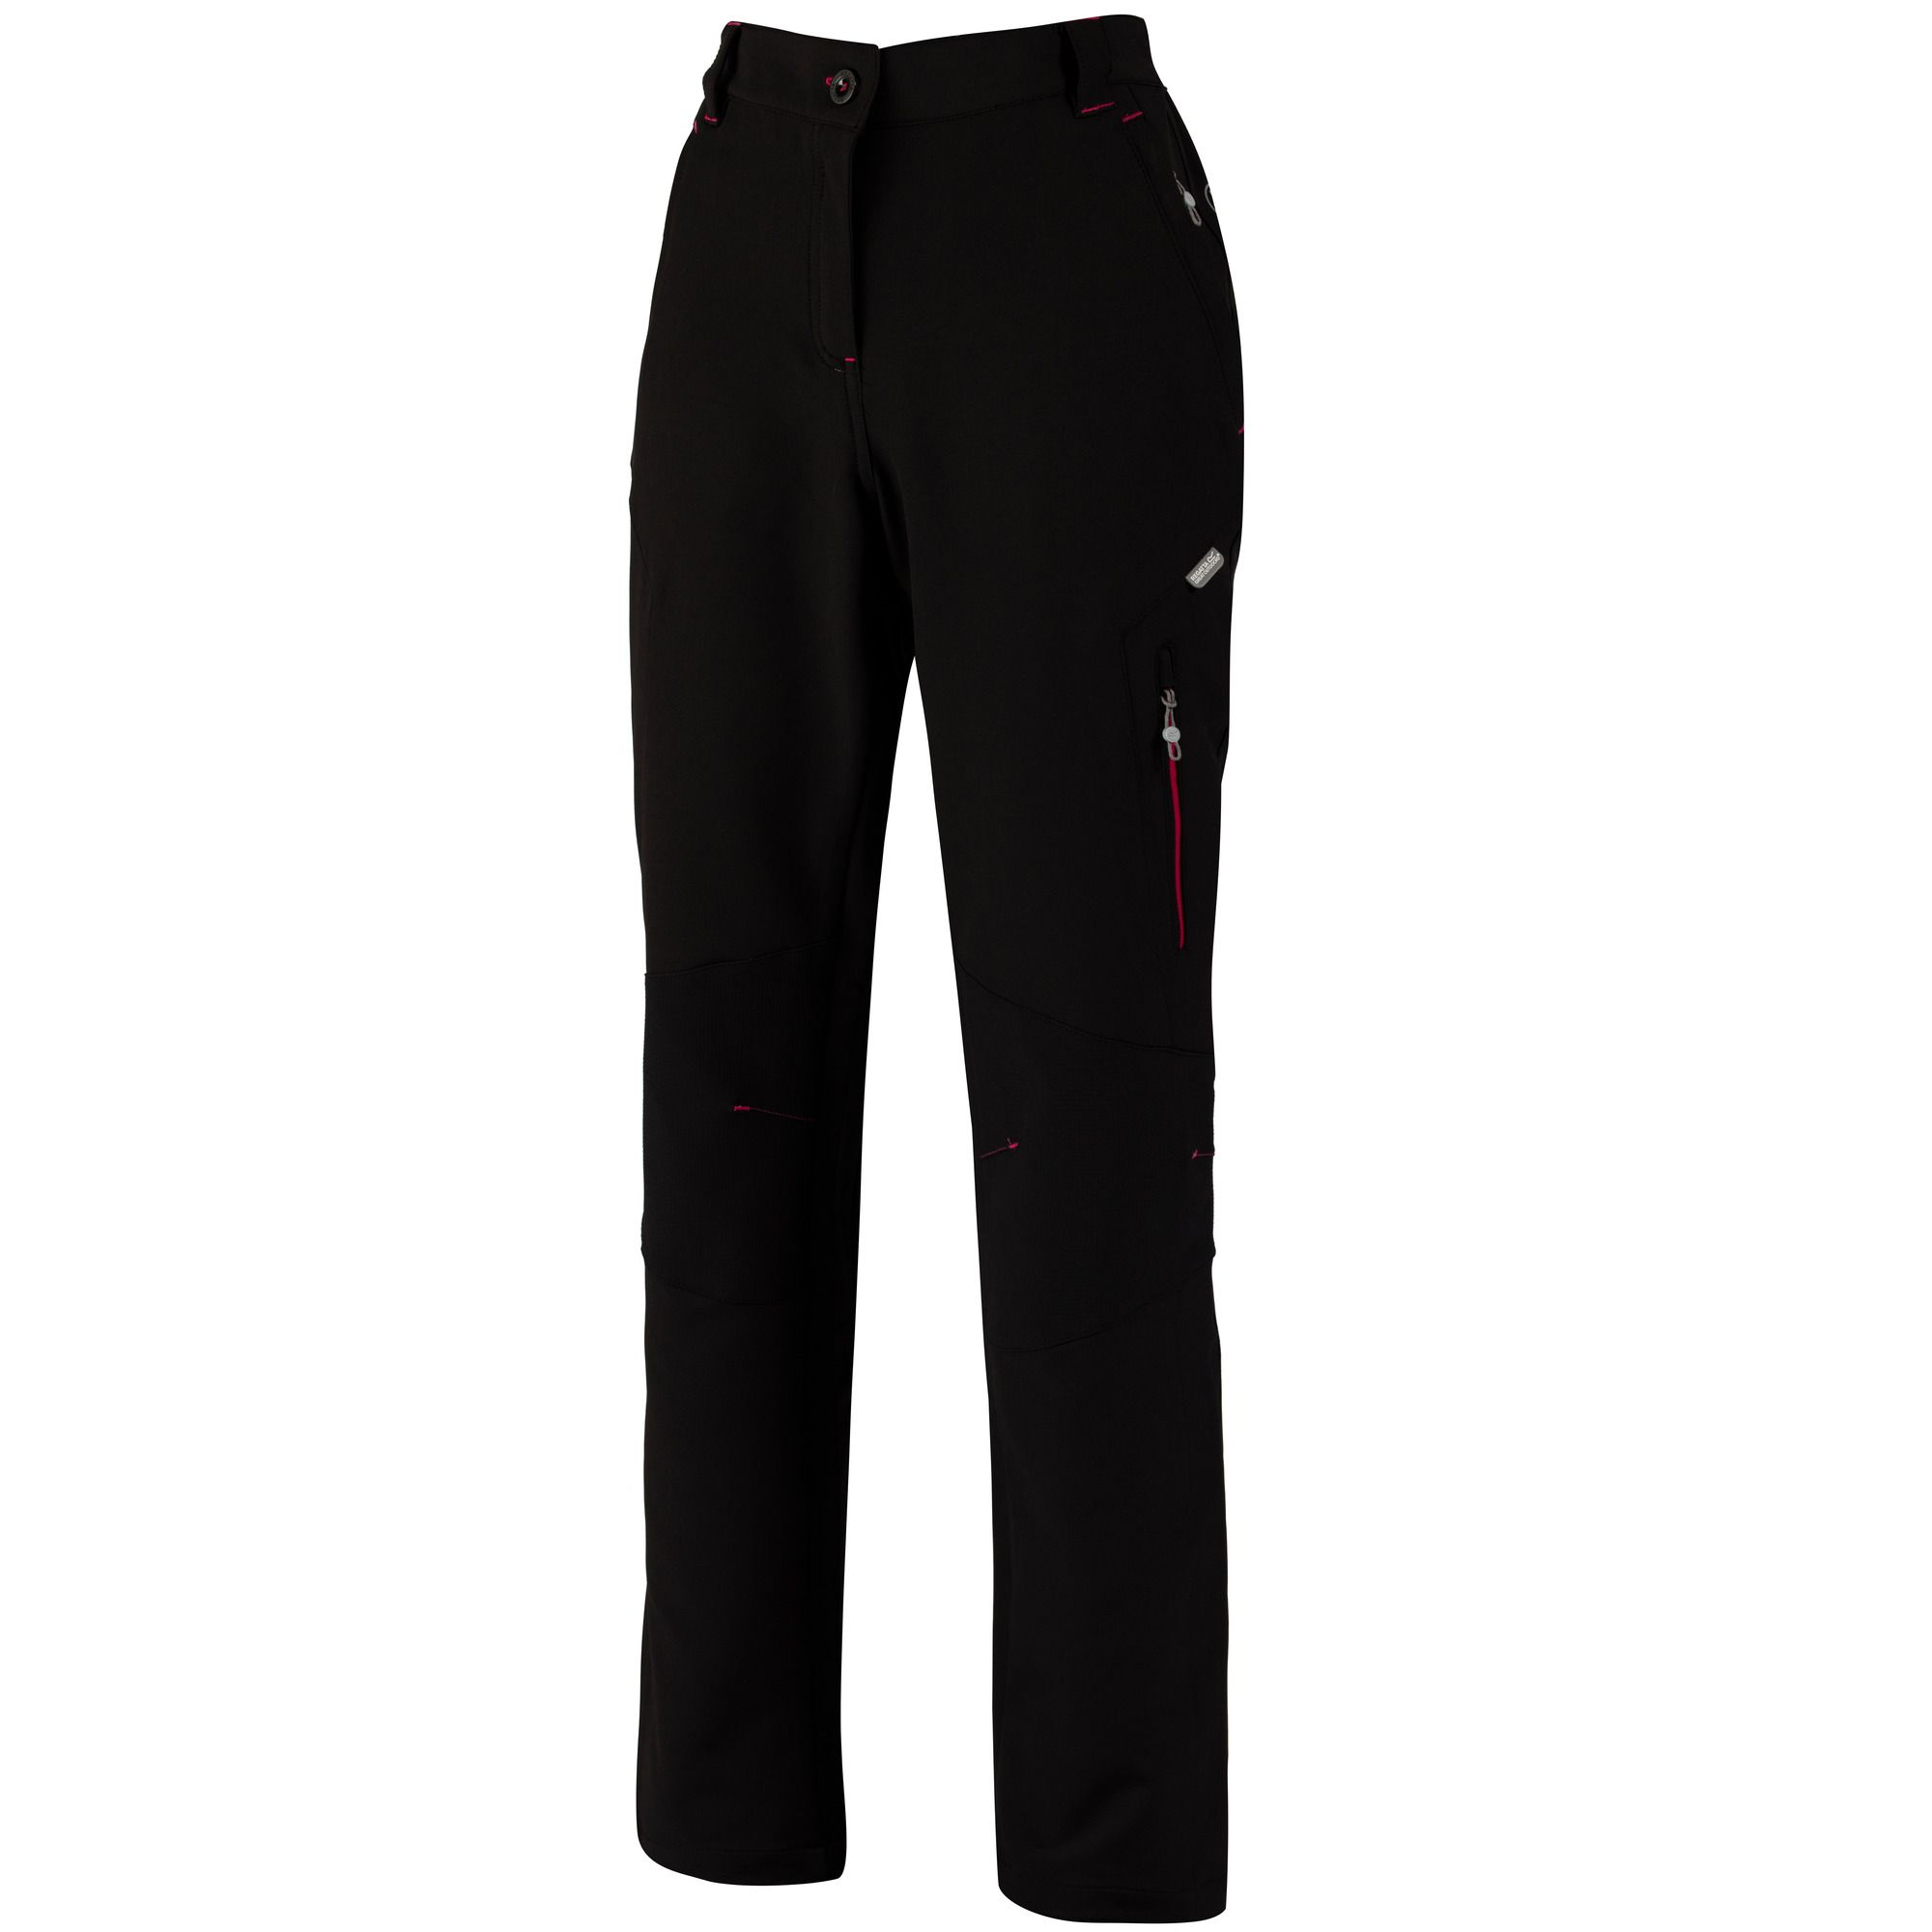 Regatta Trekkinghose | Sportbekleidung > Sporthosen > Trekkinghosen | Schwarz | Regatta